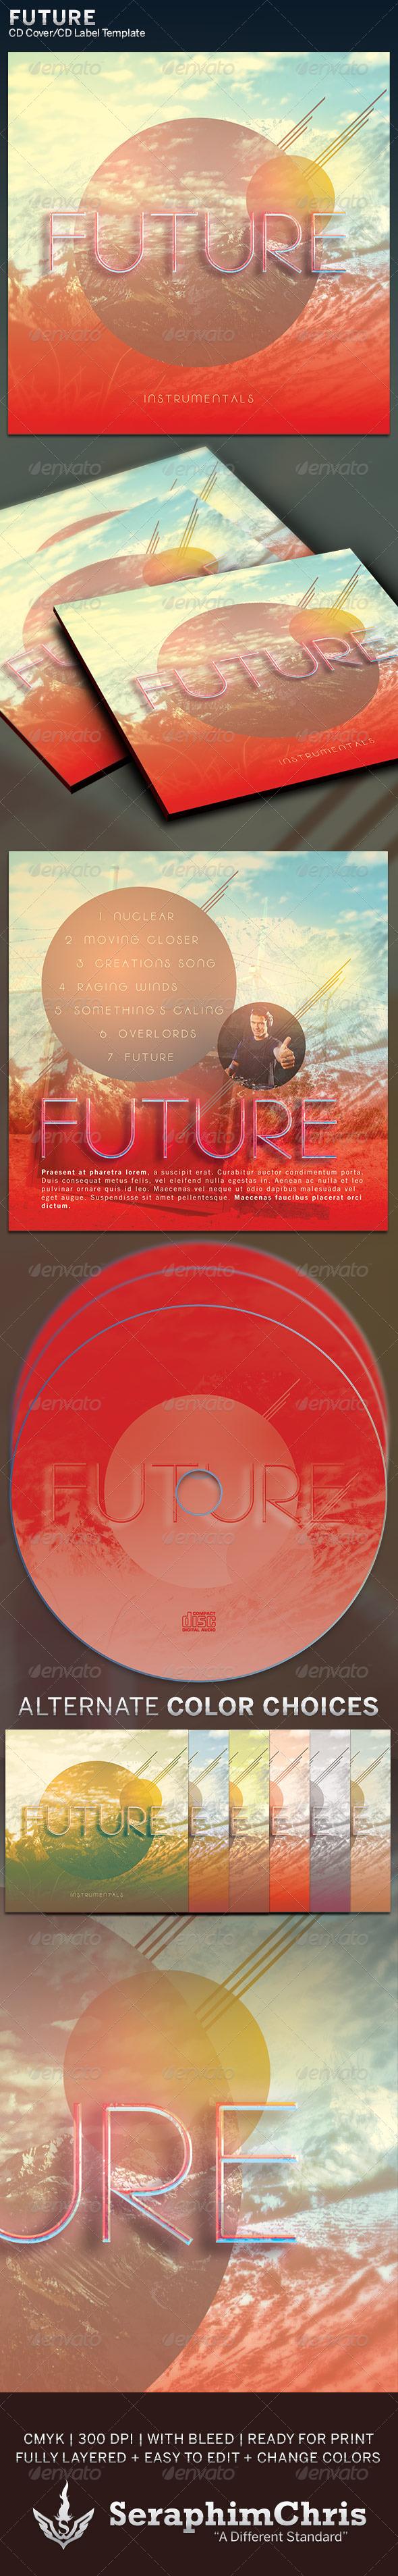 Future: CD Cover Artwork Template - CD & DVD Artwork Print Templates